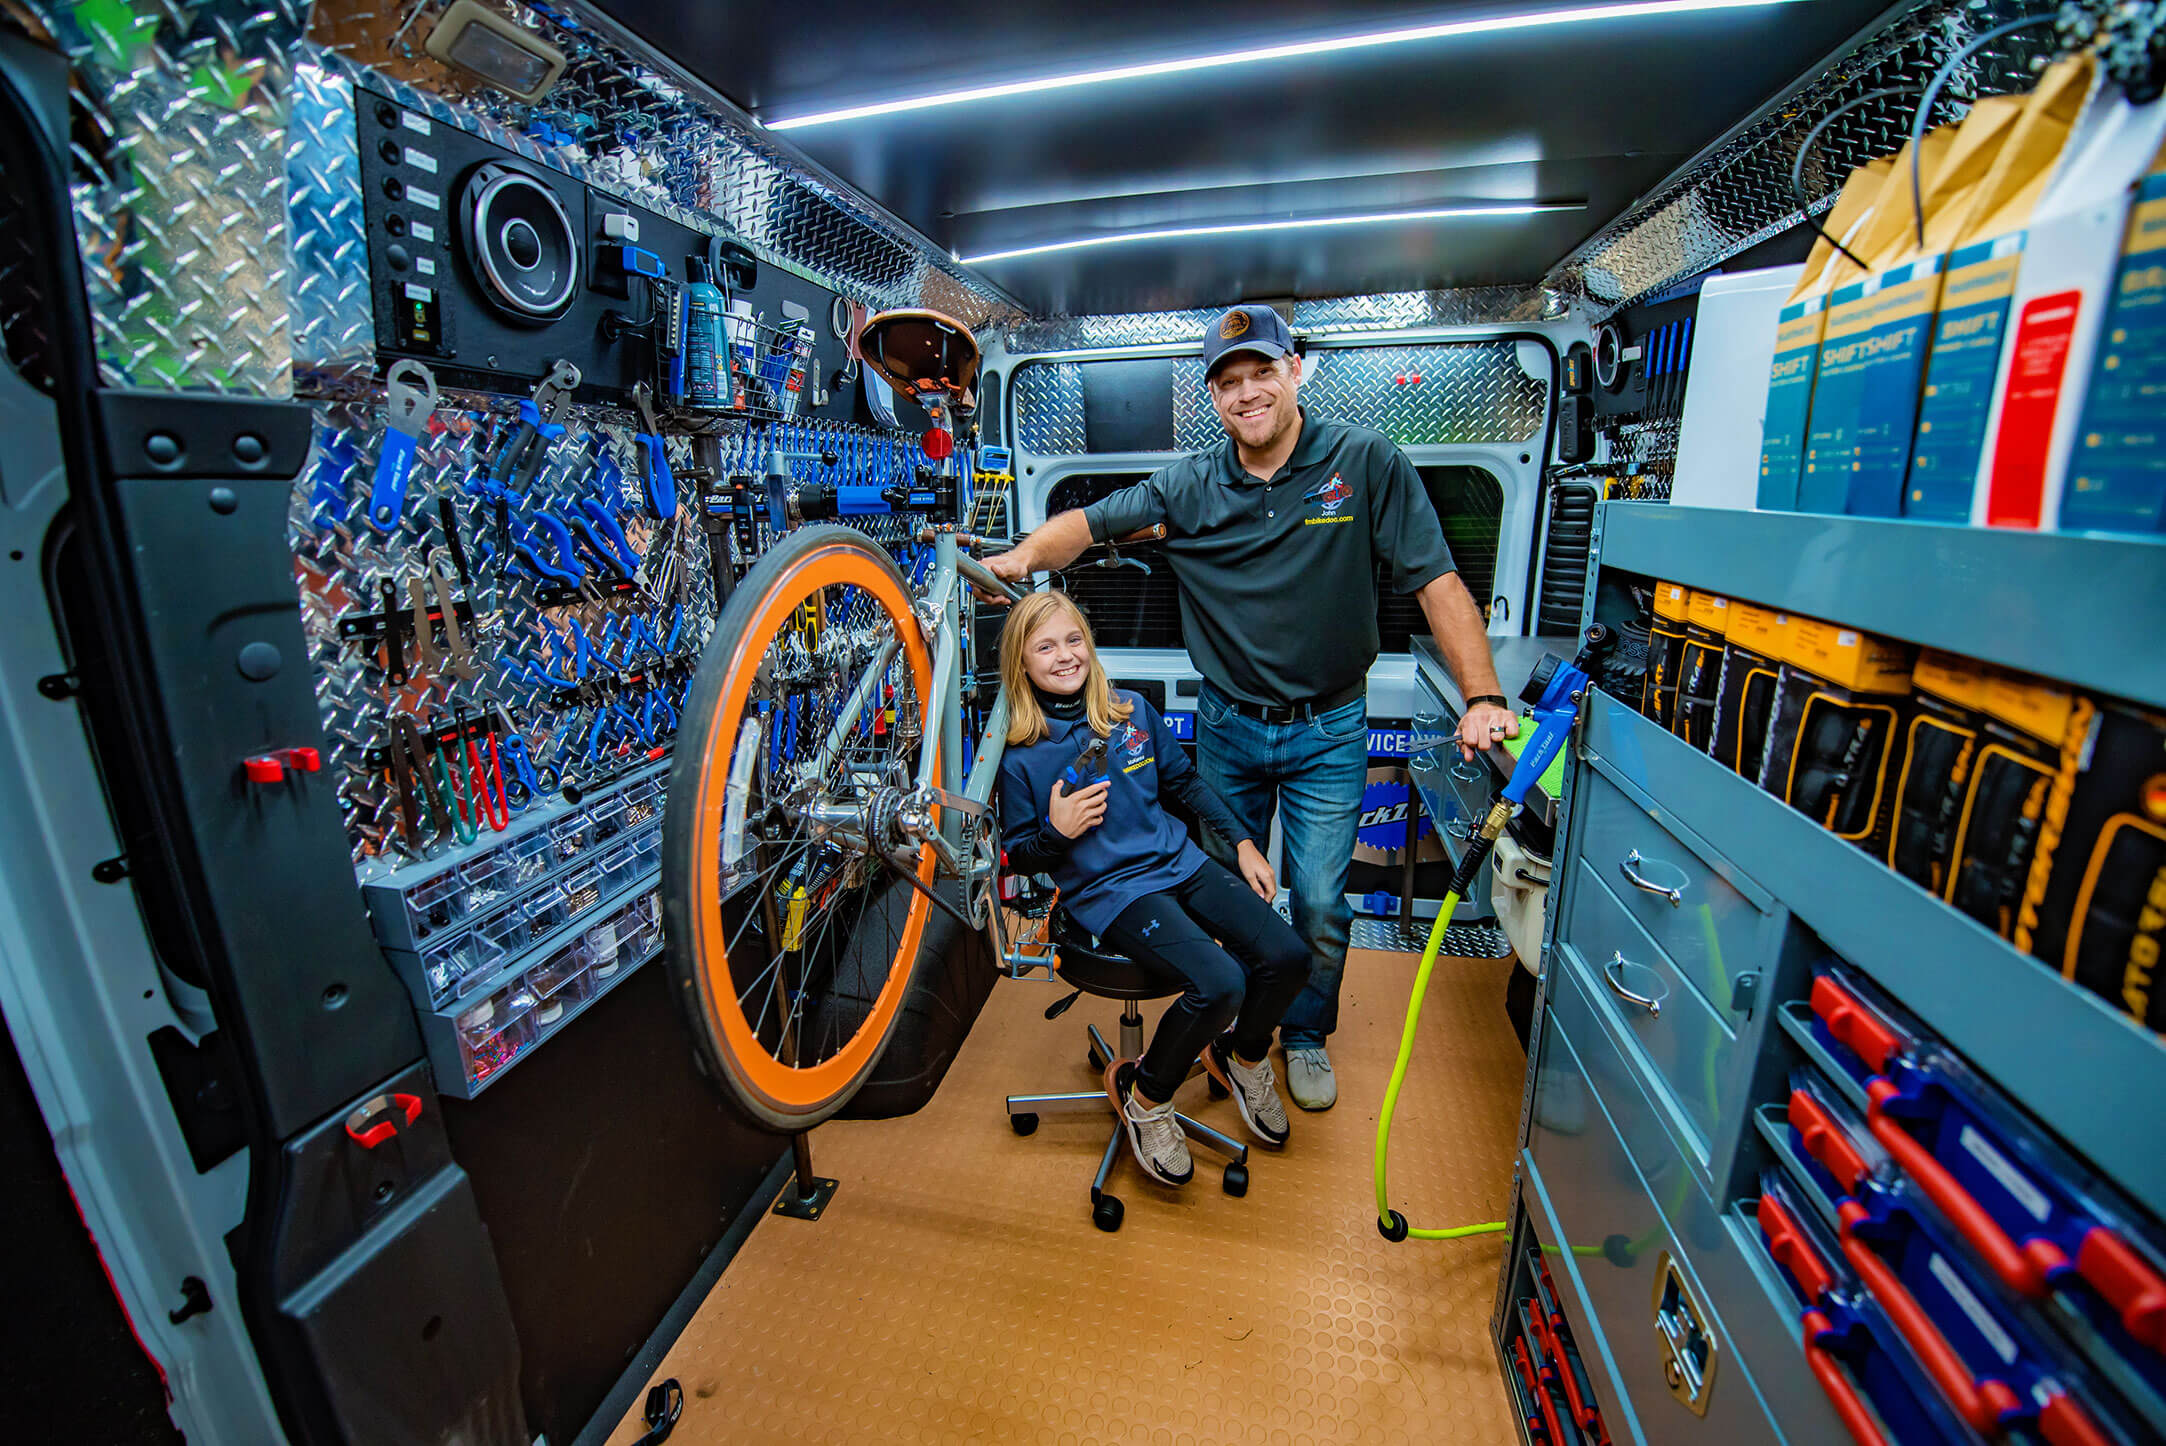 Full-service bicycle repair shop in fargo nd - Mobile Bike Doctor